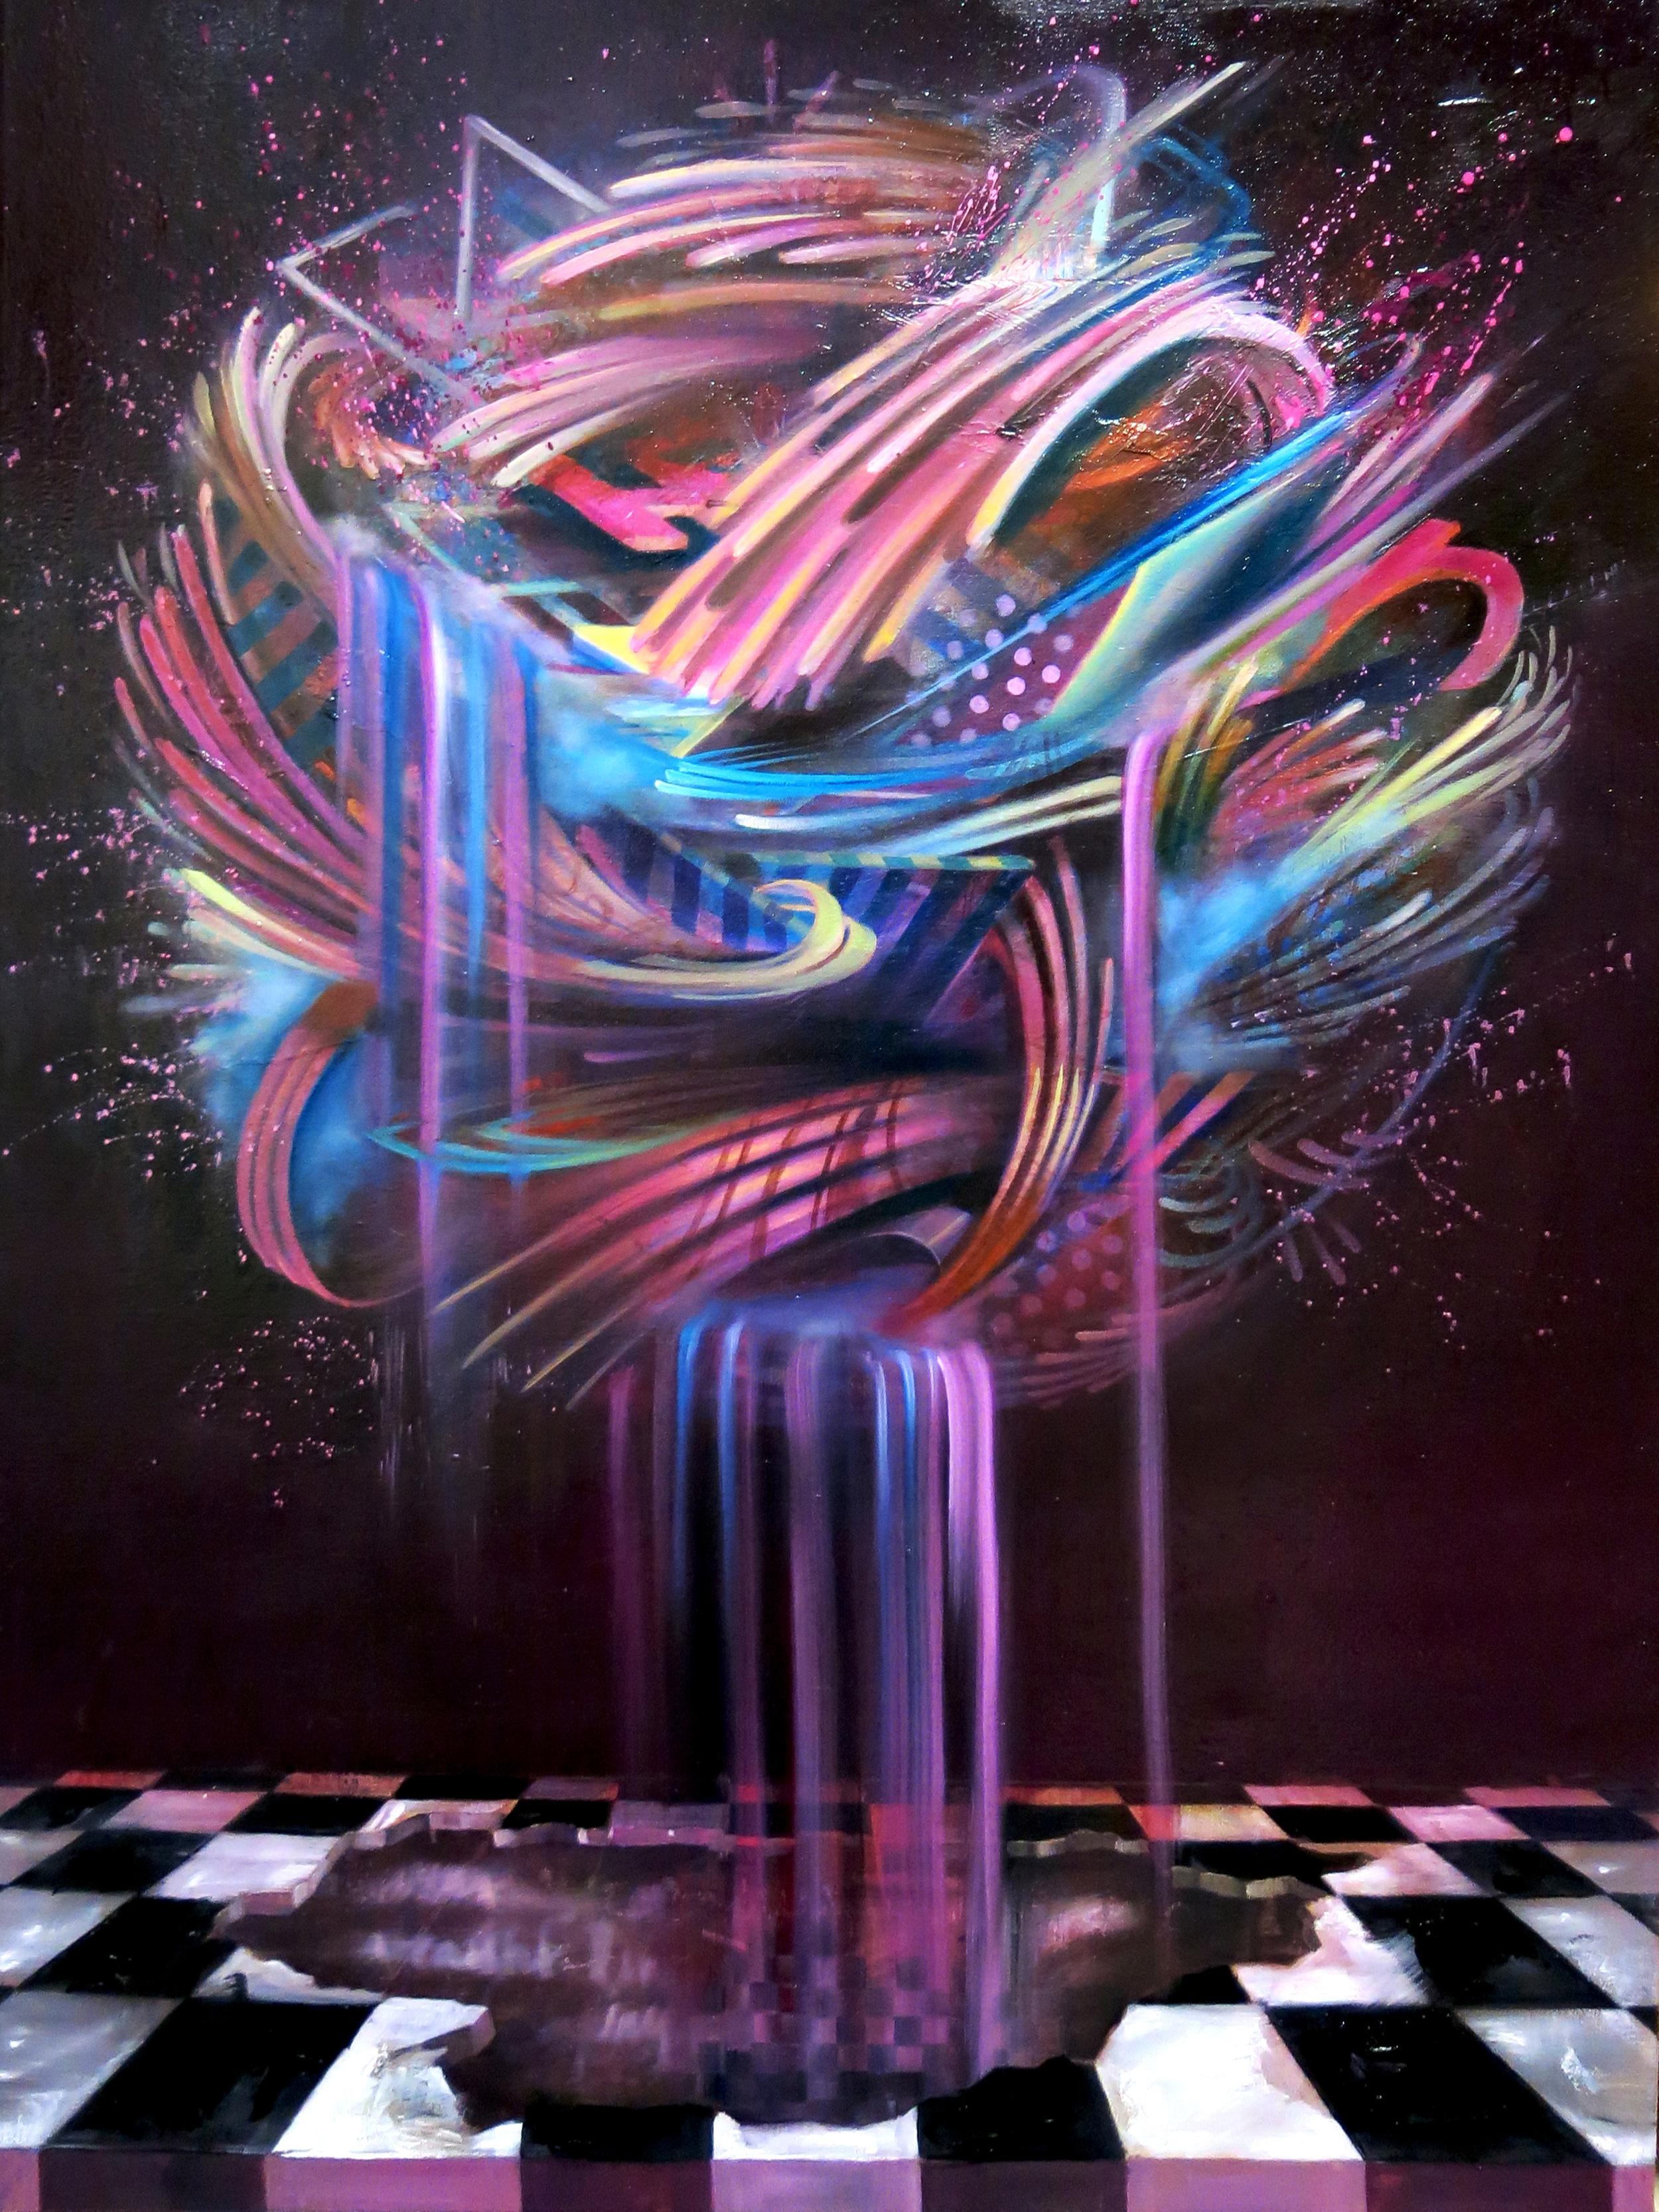 "|Oil on Canvas||30"" x 40""||2015|"